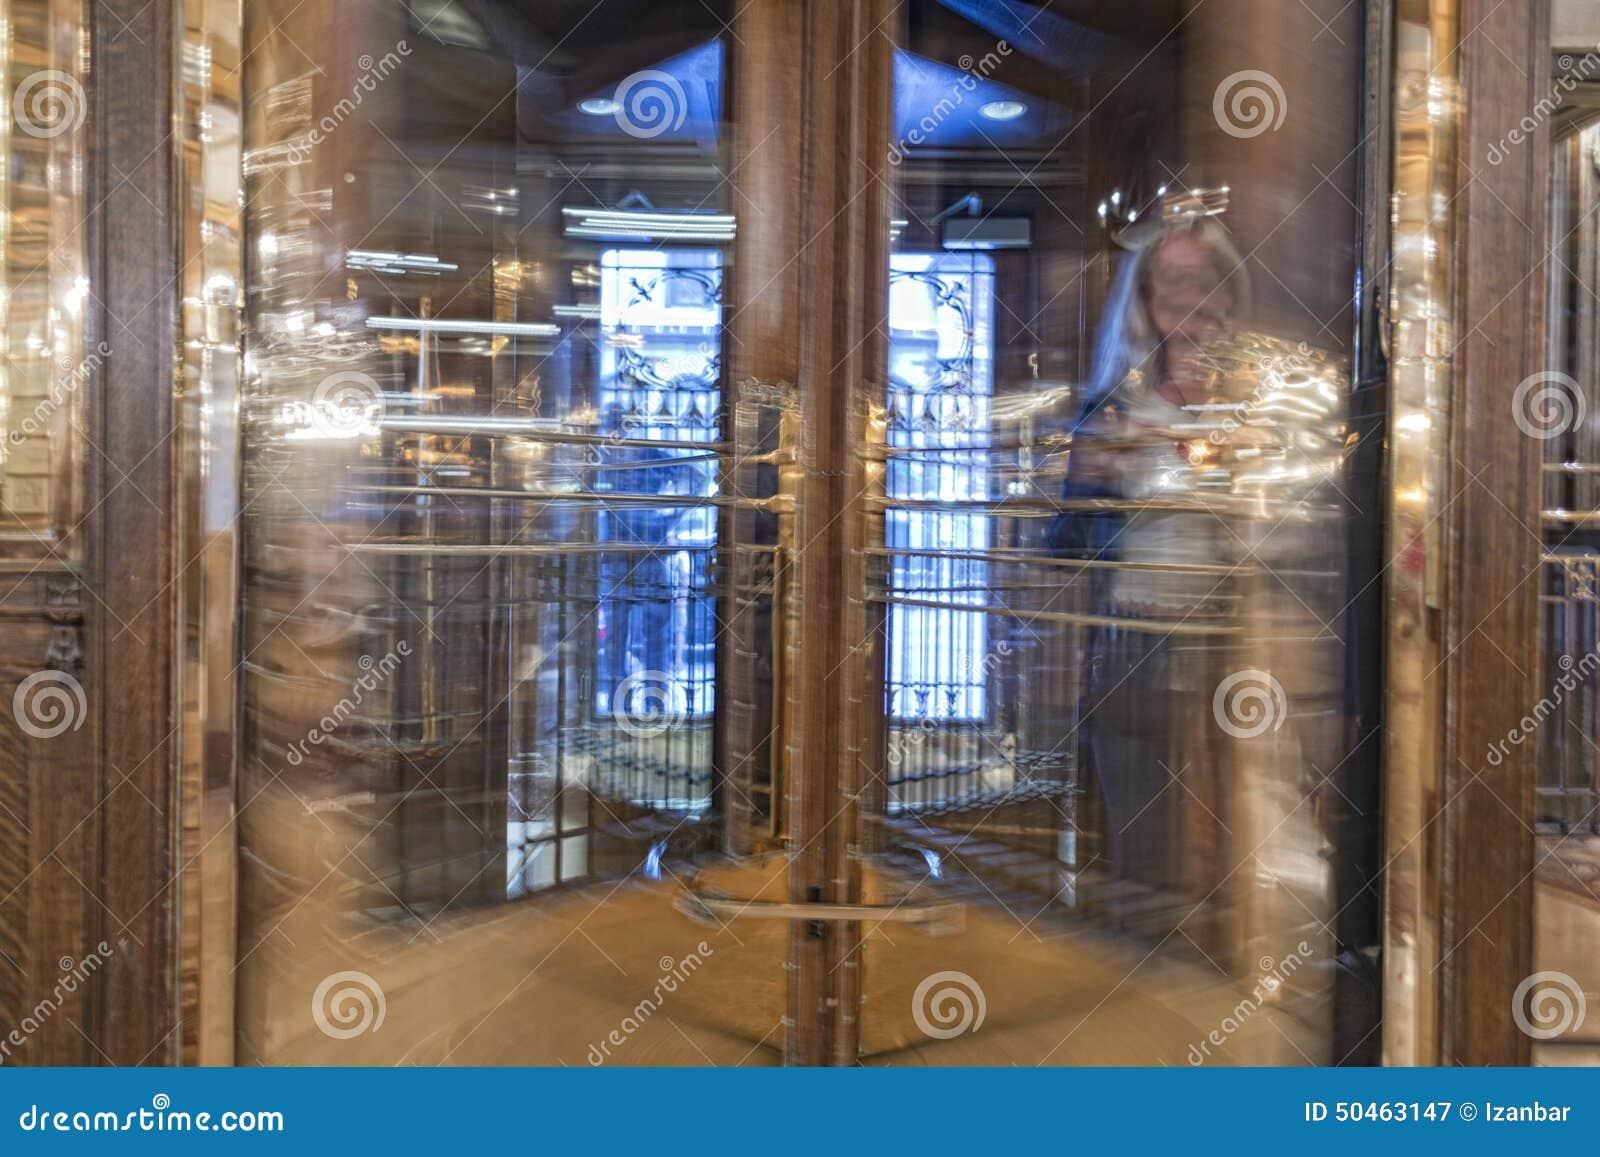 Revolving Door Building Hotel Entrance Stock Image - Image of ...